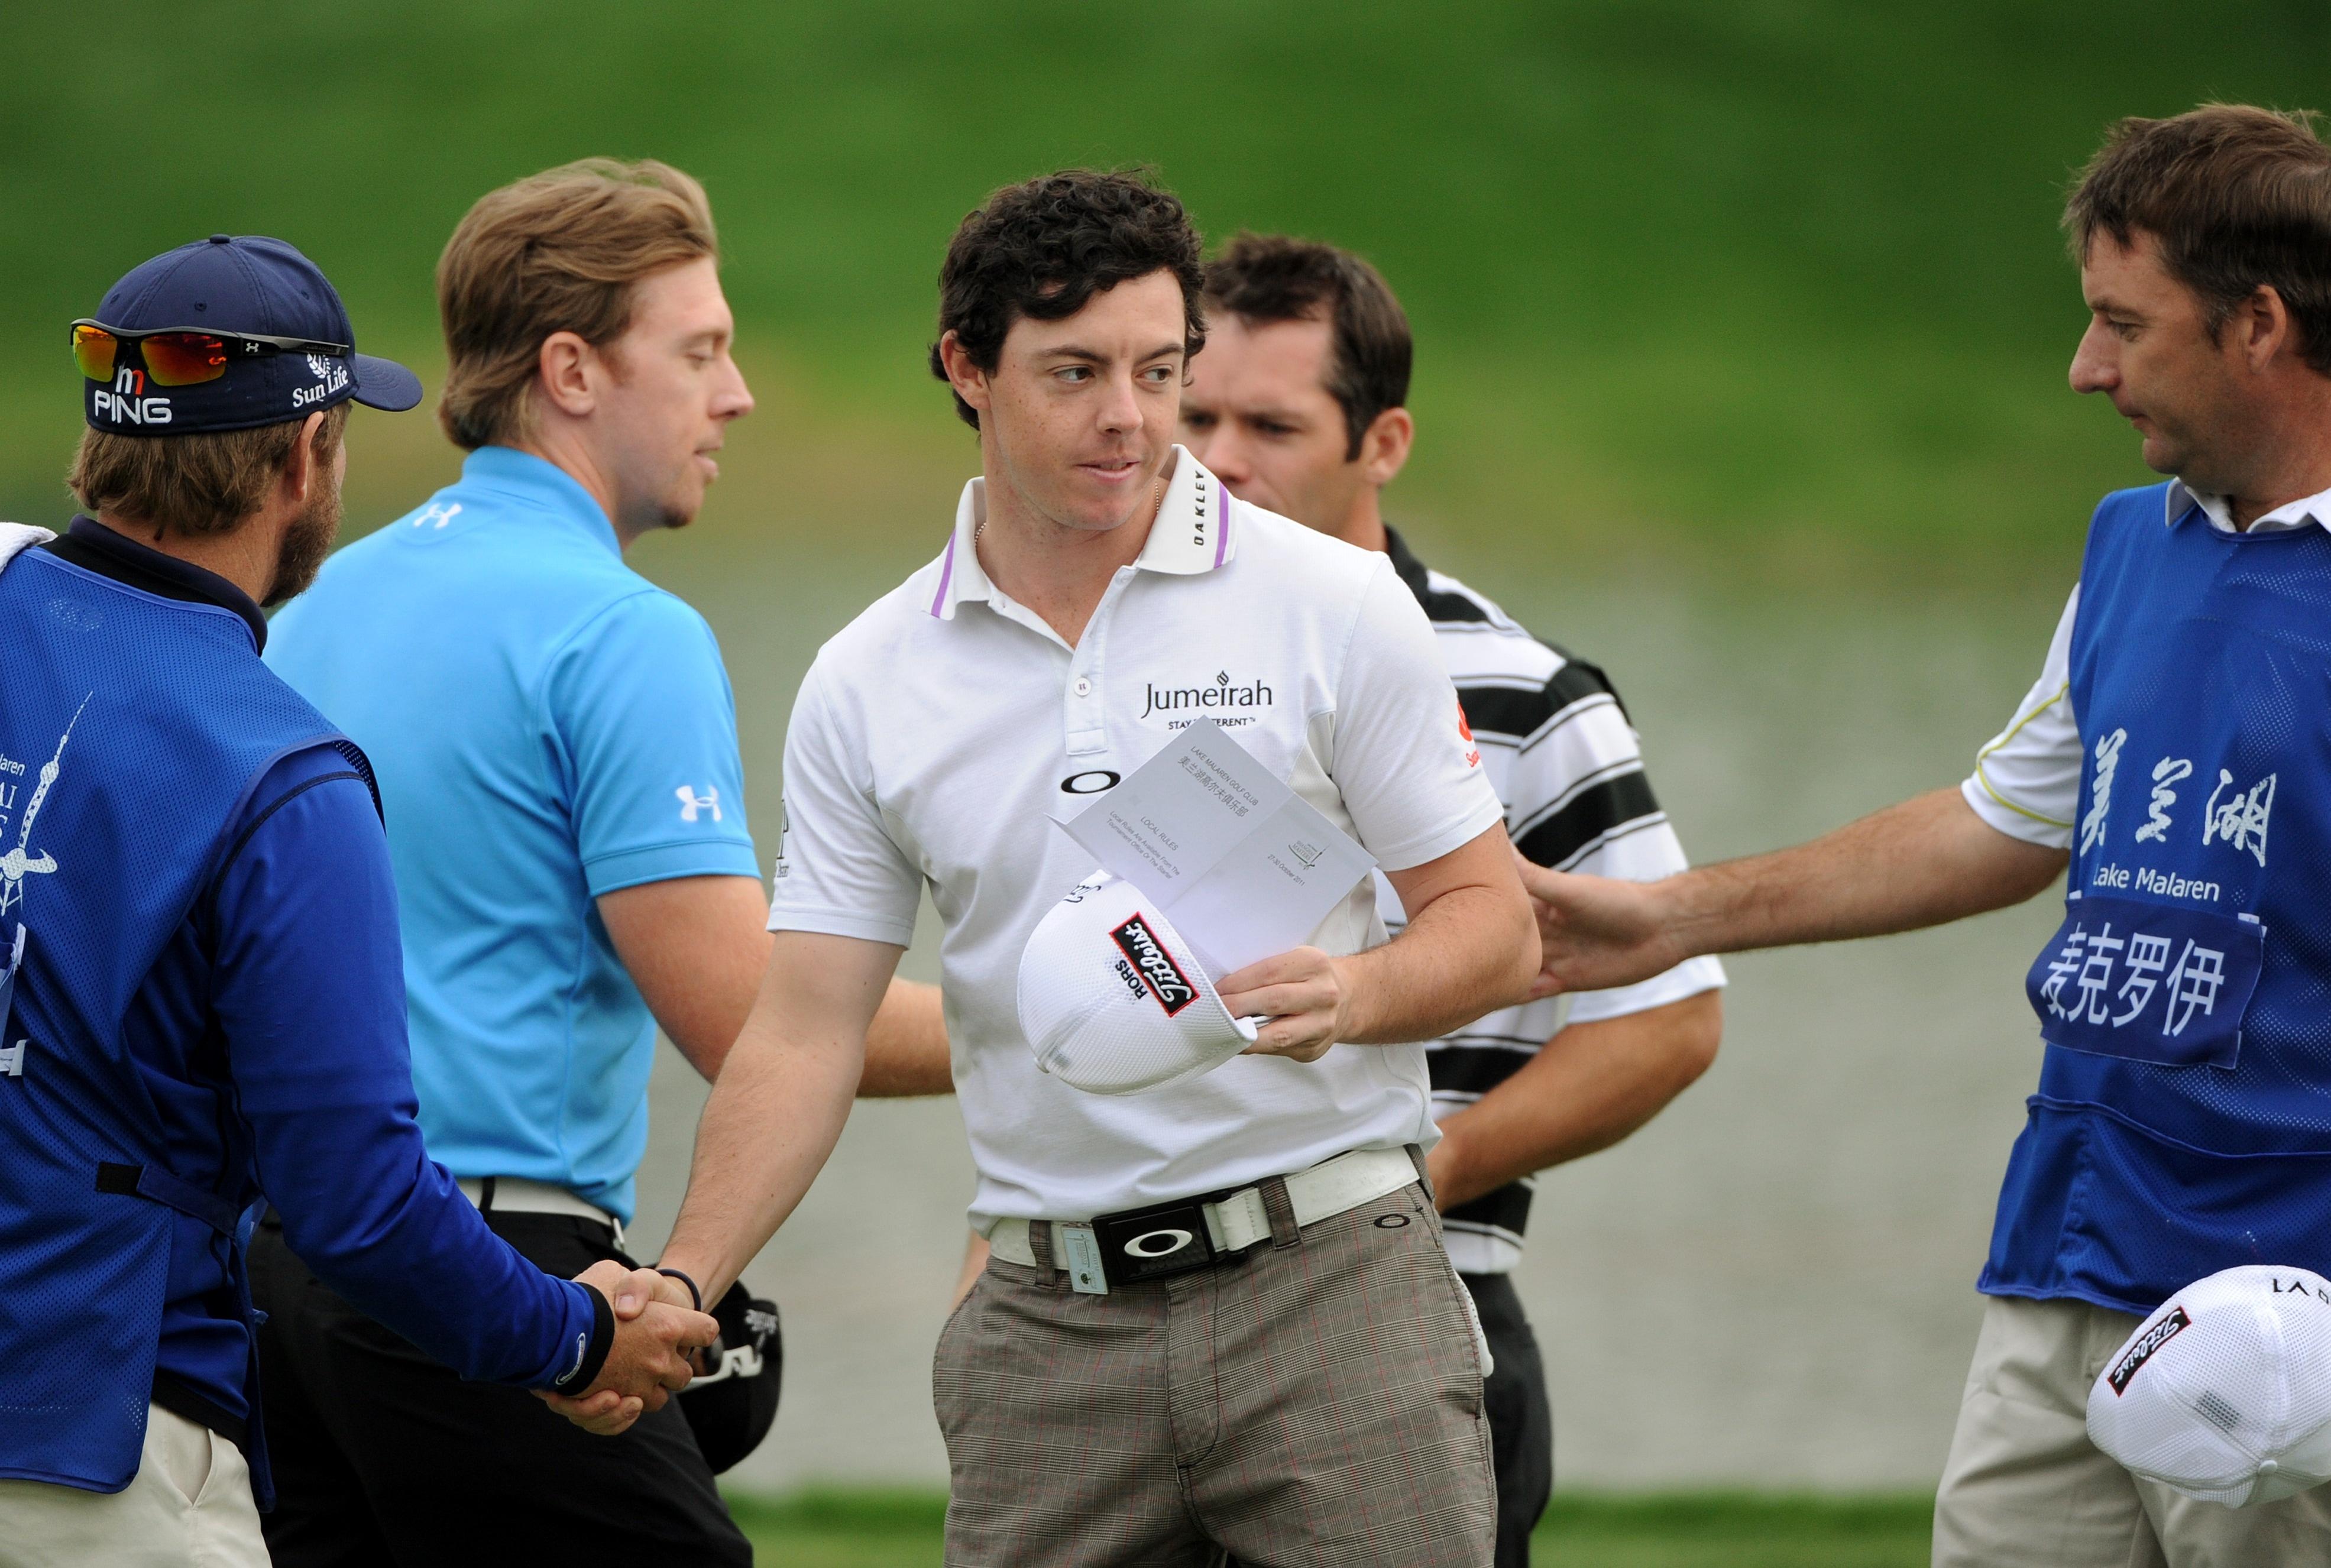 Rory McIlroy, Hunter Mahan and Paul Casey